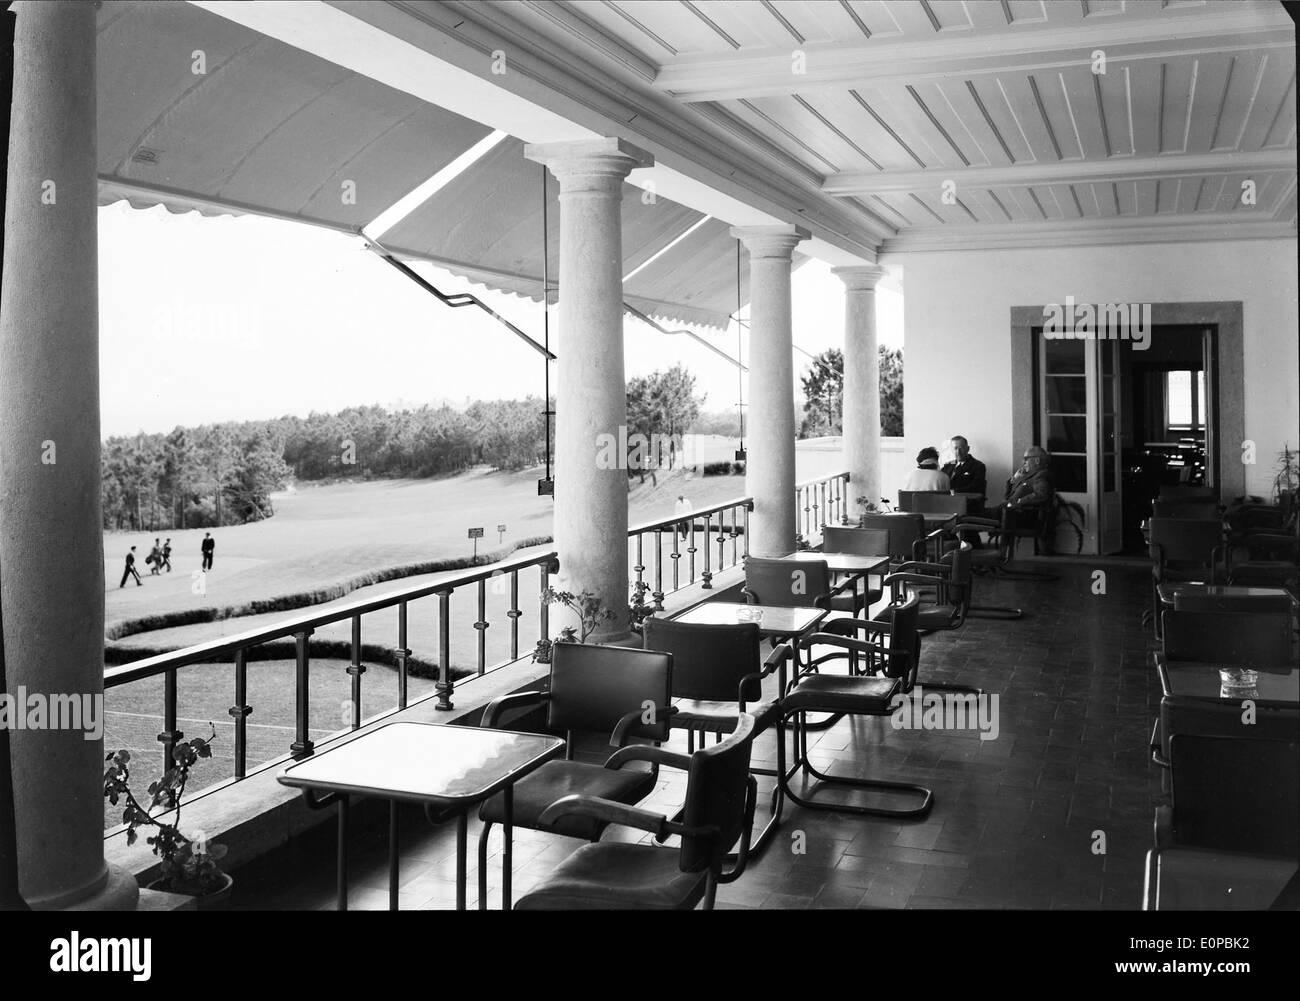 hotel do parque estoril portugal stock photo royalty free image 69333574 alamy. Black Bedroom Furniture Sets. Home Design Ideas